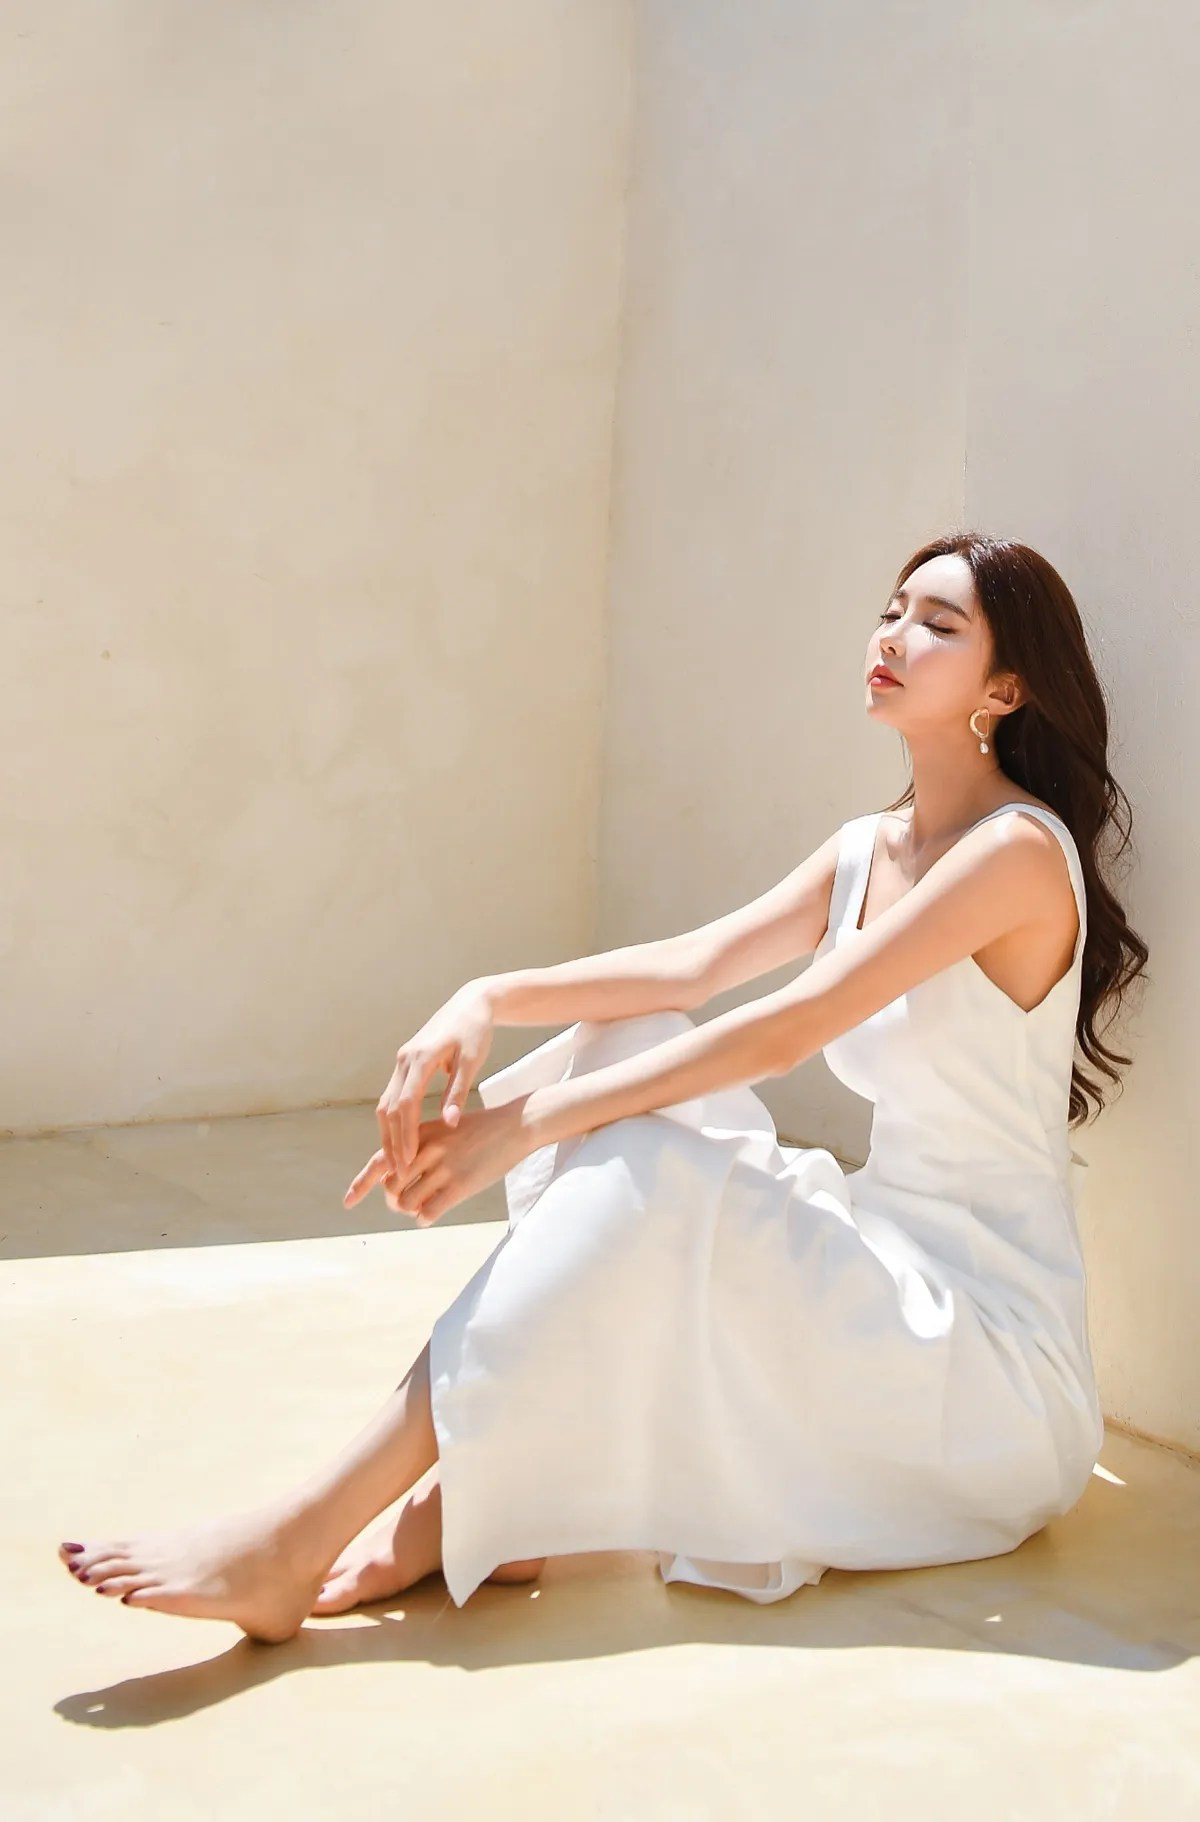 Park Suyeon / vendis / May 2021 / Sundress & Monokini Photoshoot Part 4